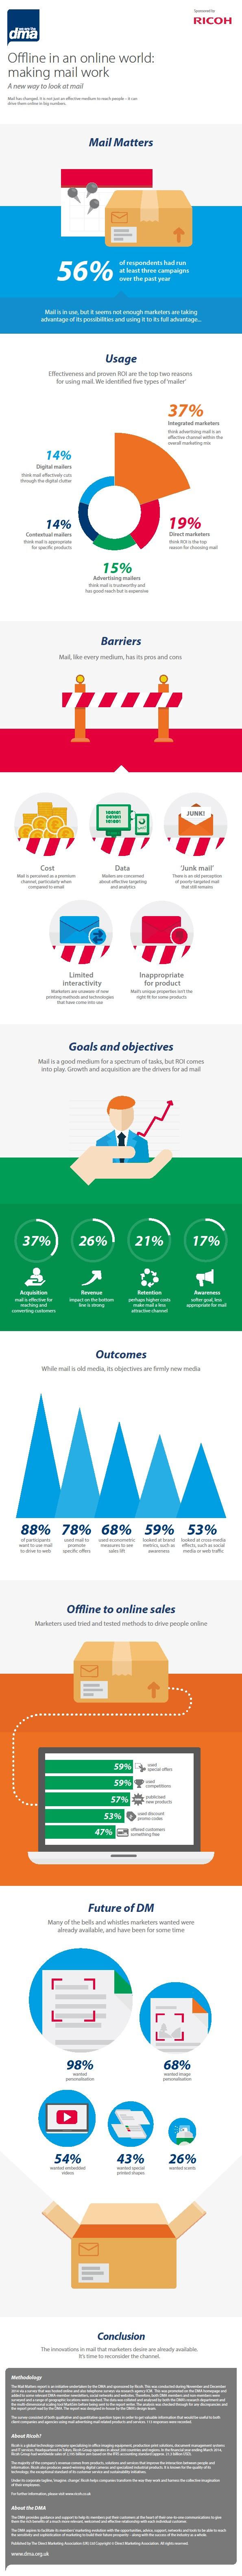 Ricoh-infographic-2015%20copy%20%285%29.jpg